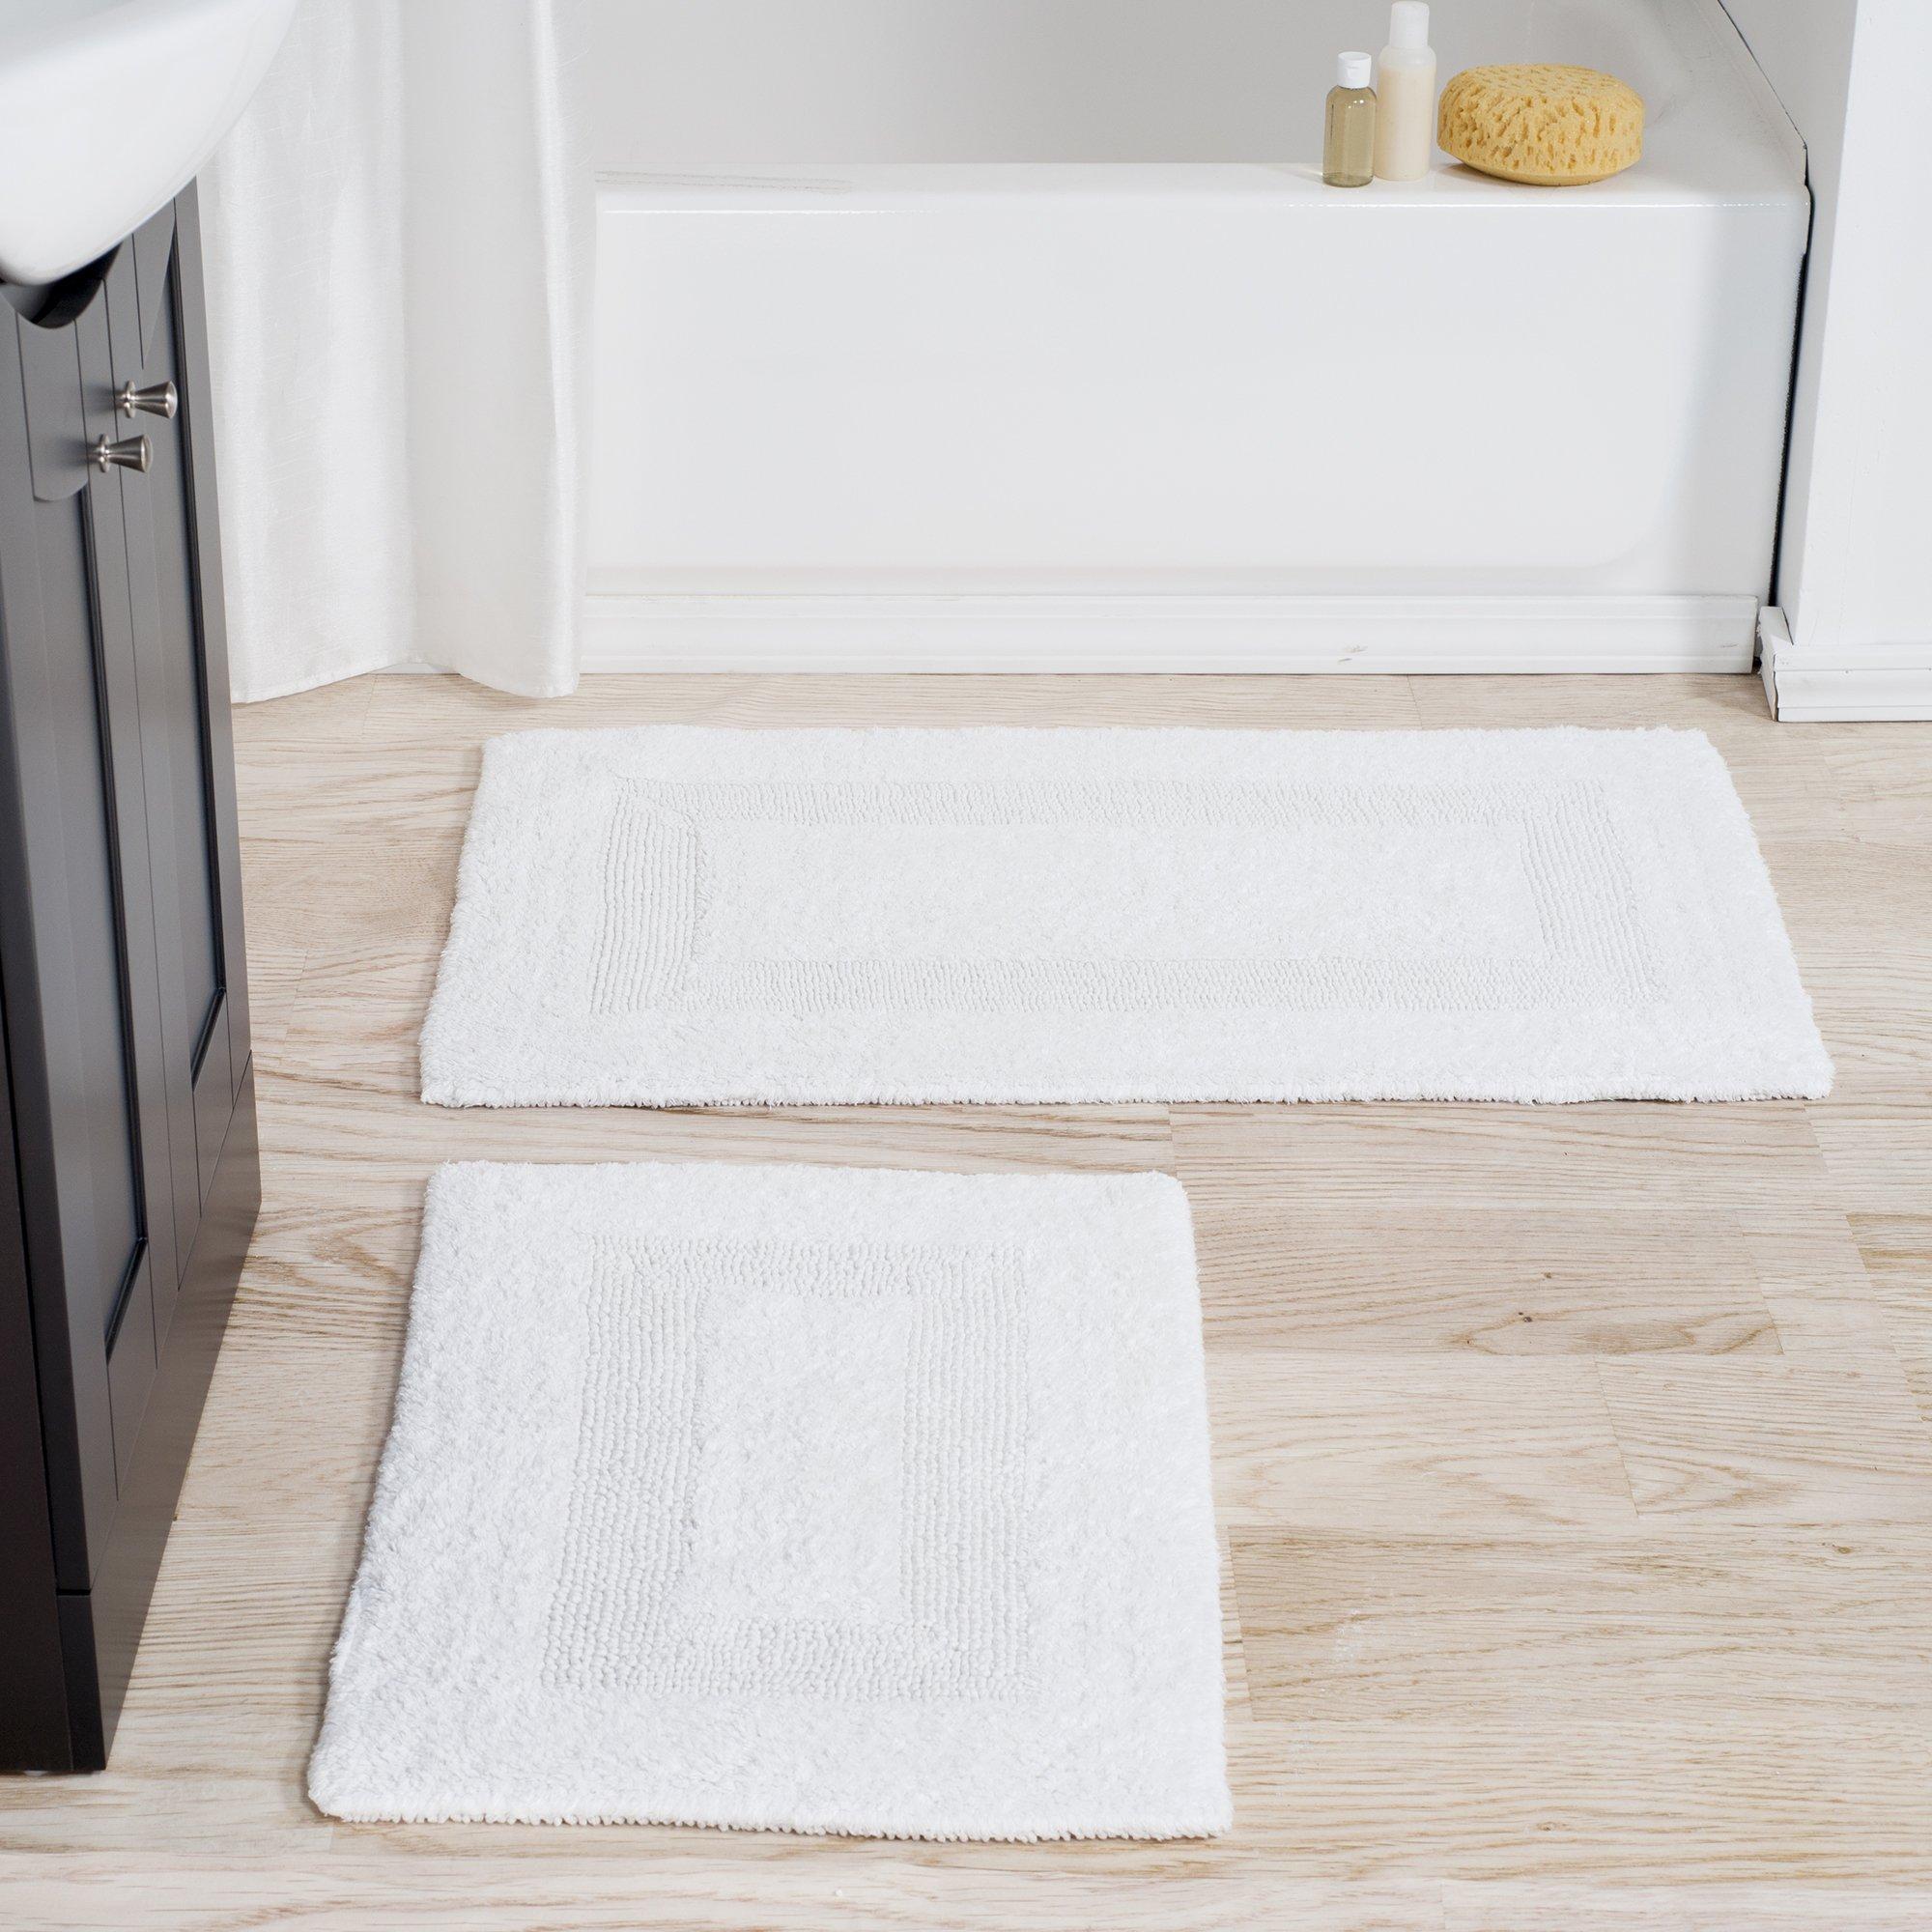 Cotton Bath Mat Set- 2 Piece 100 Percent Cotton Mats- Reversible, Soft, Absorbent and Machine Washable Bathroom Rugs By Lavish Home (White)